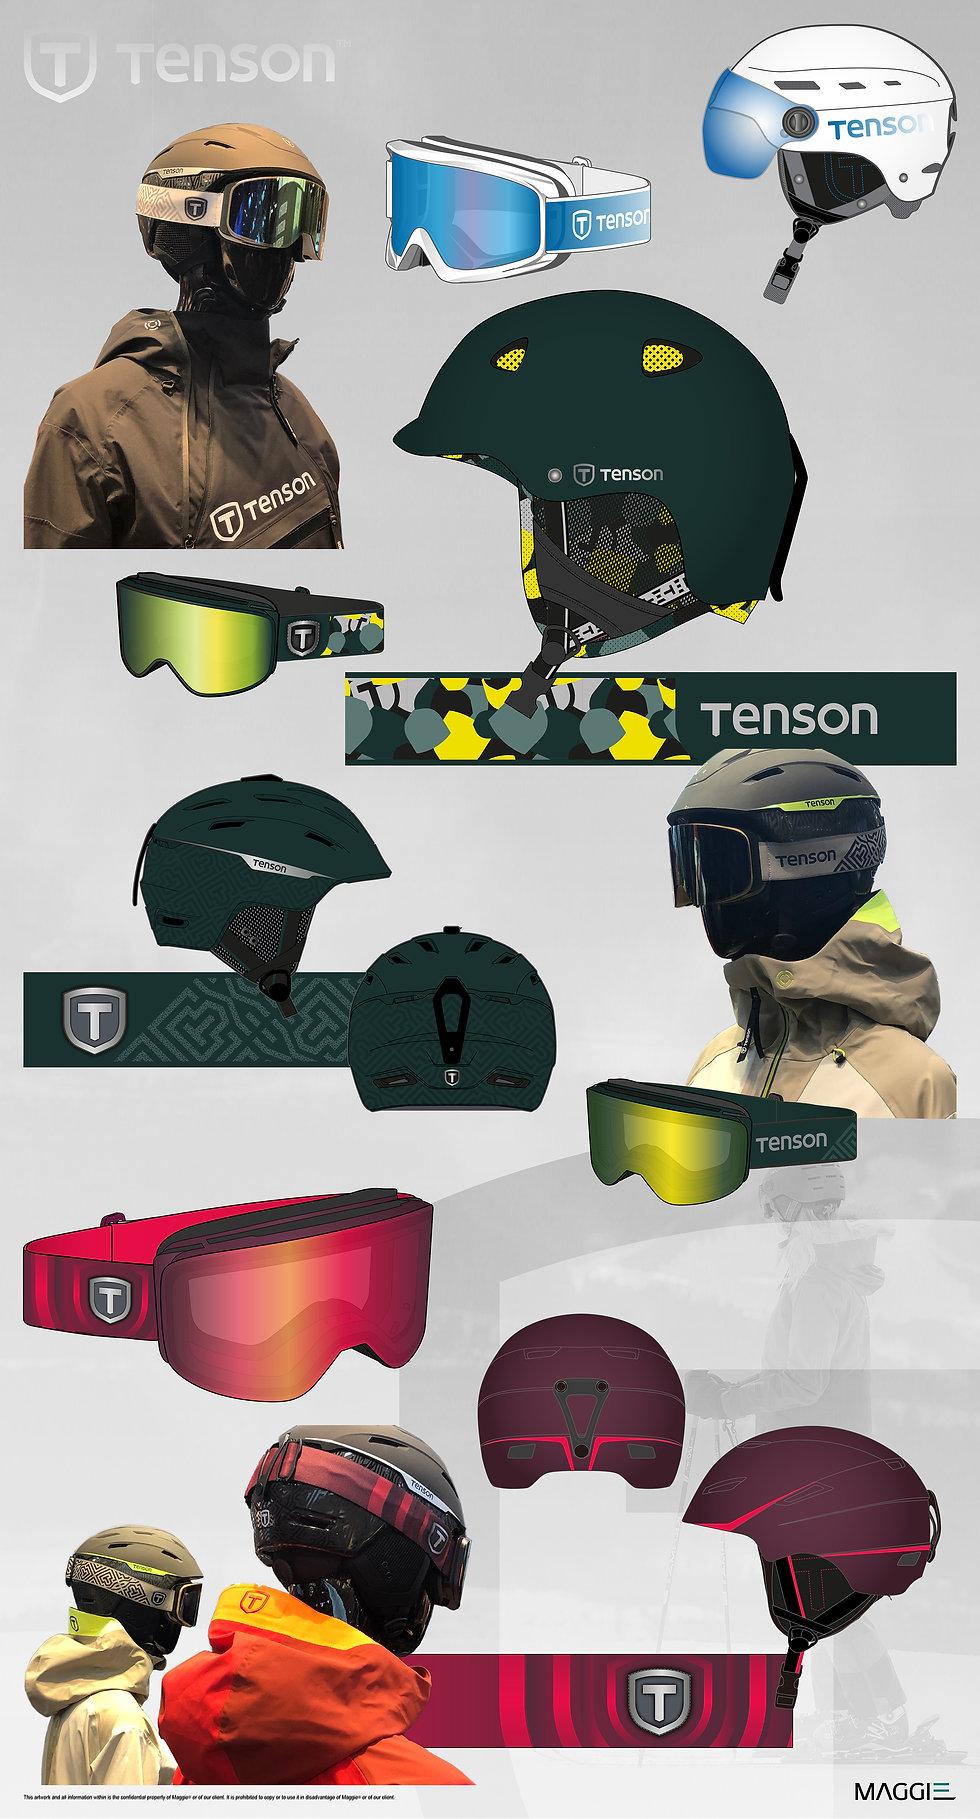 Tenson2020-helmets-s.jpg